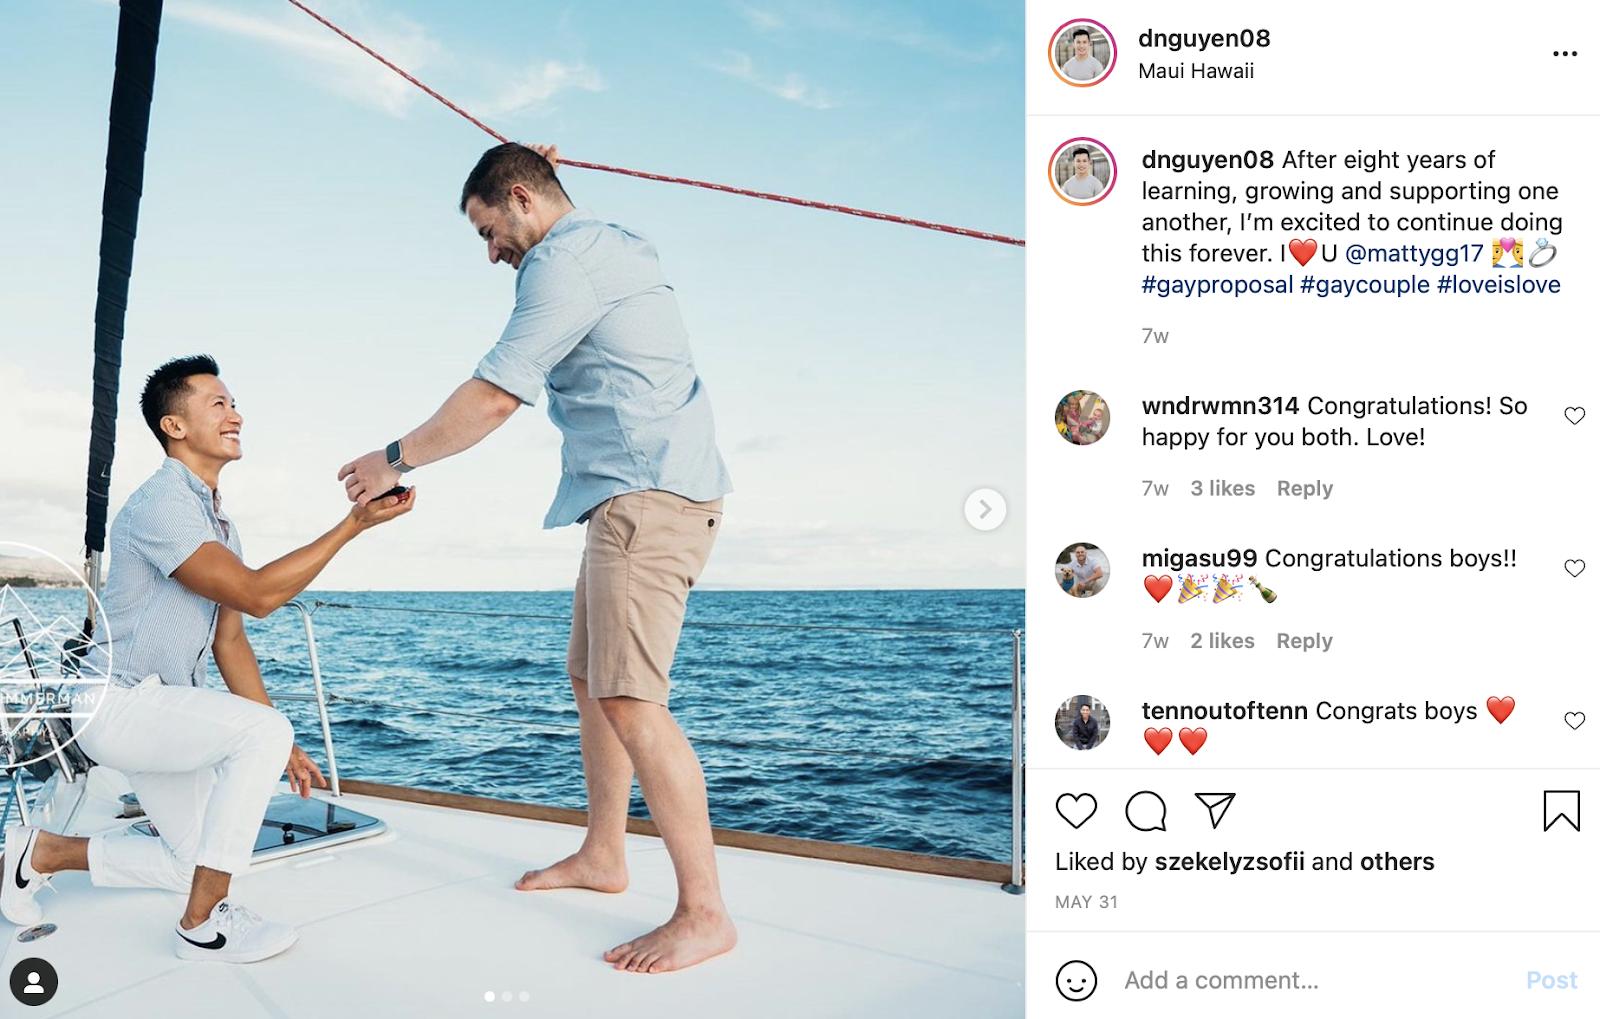 wedding proposal on a boat instagram photo